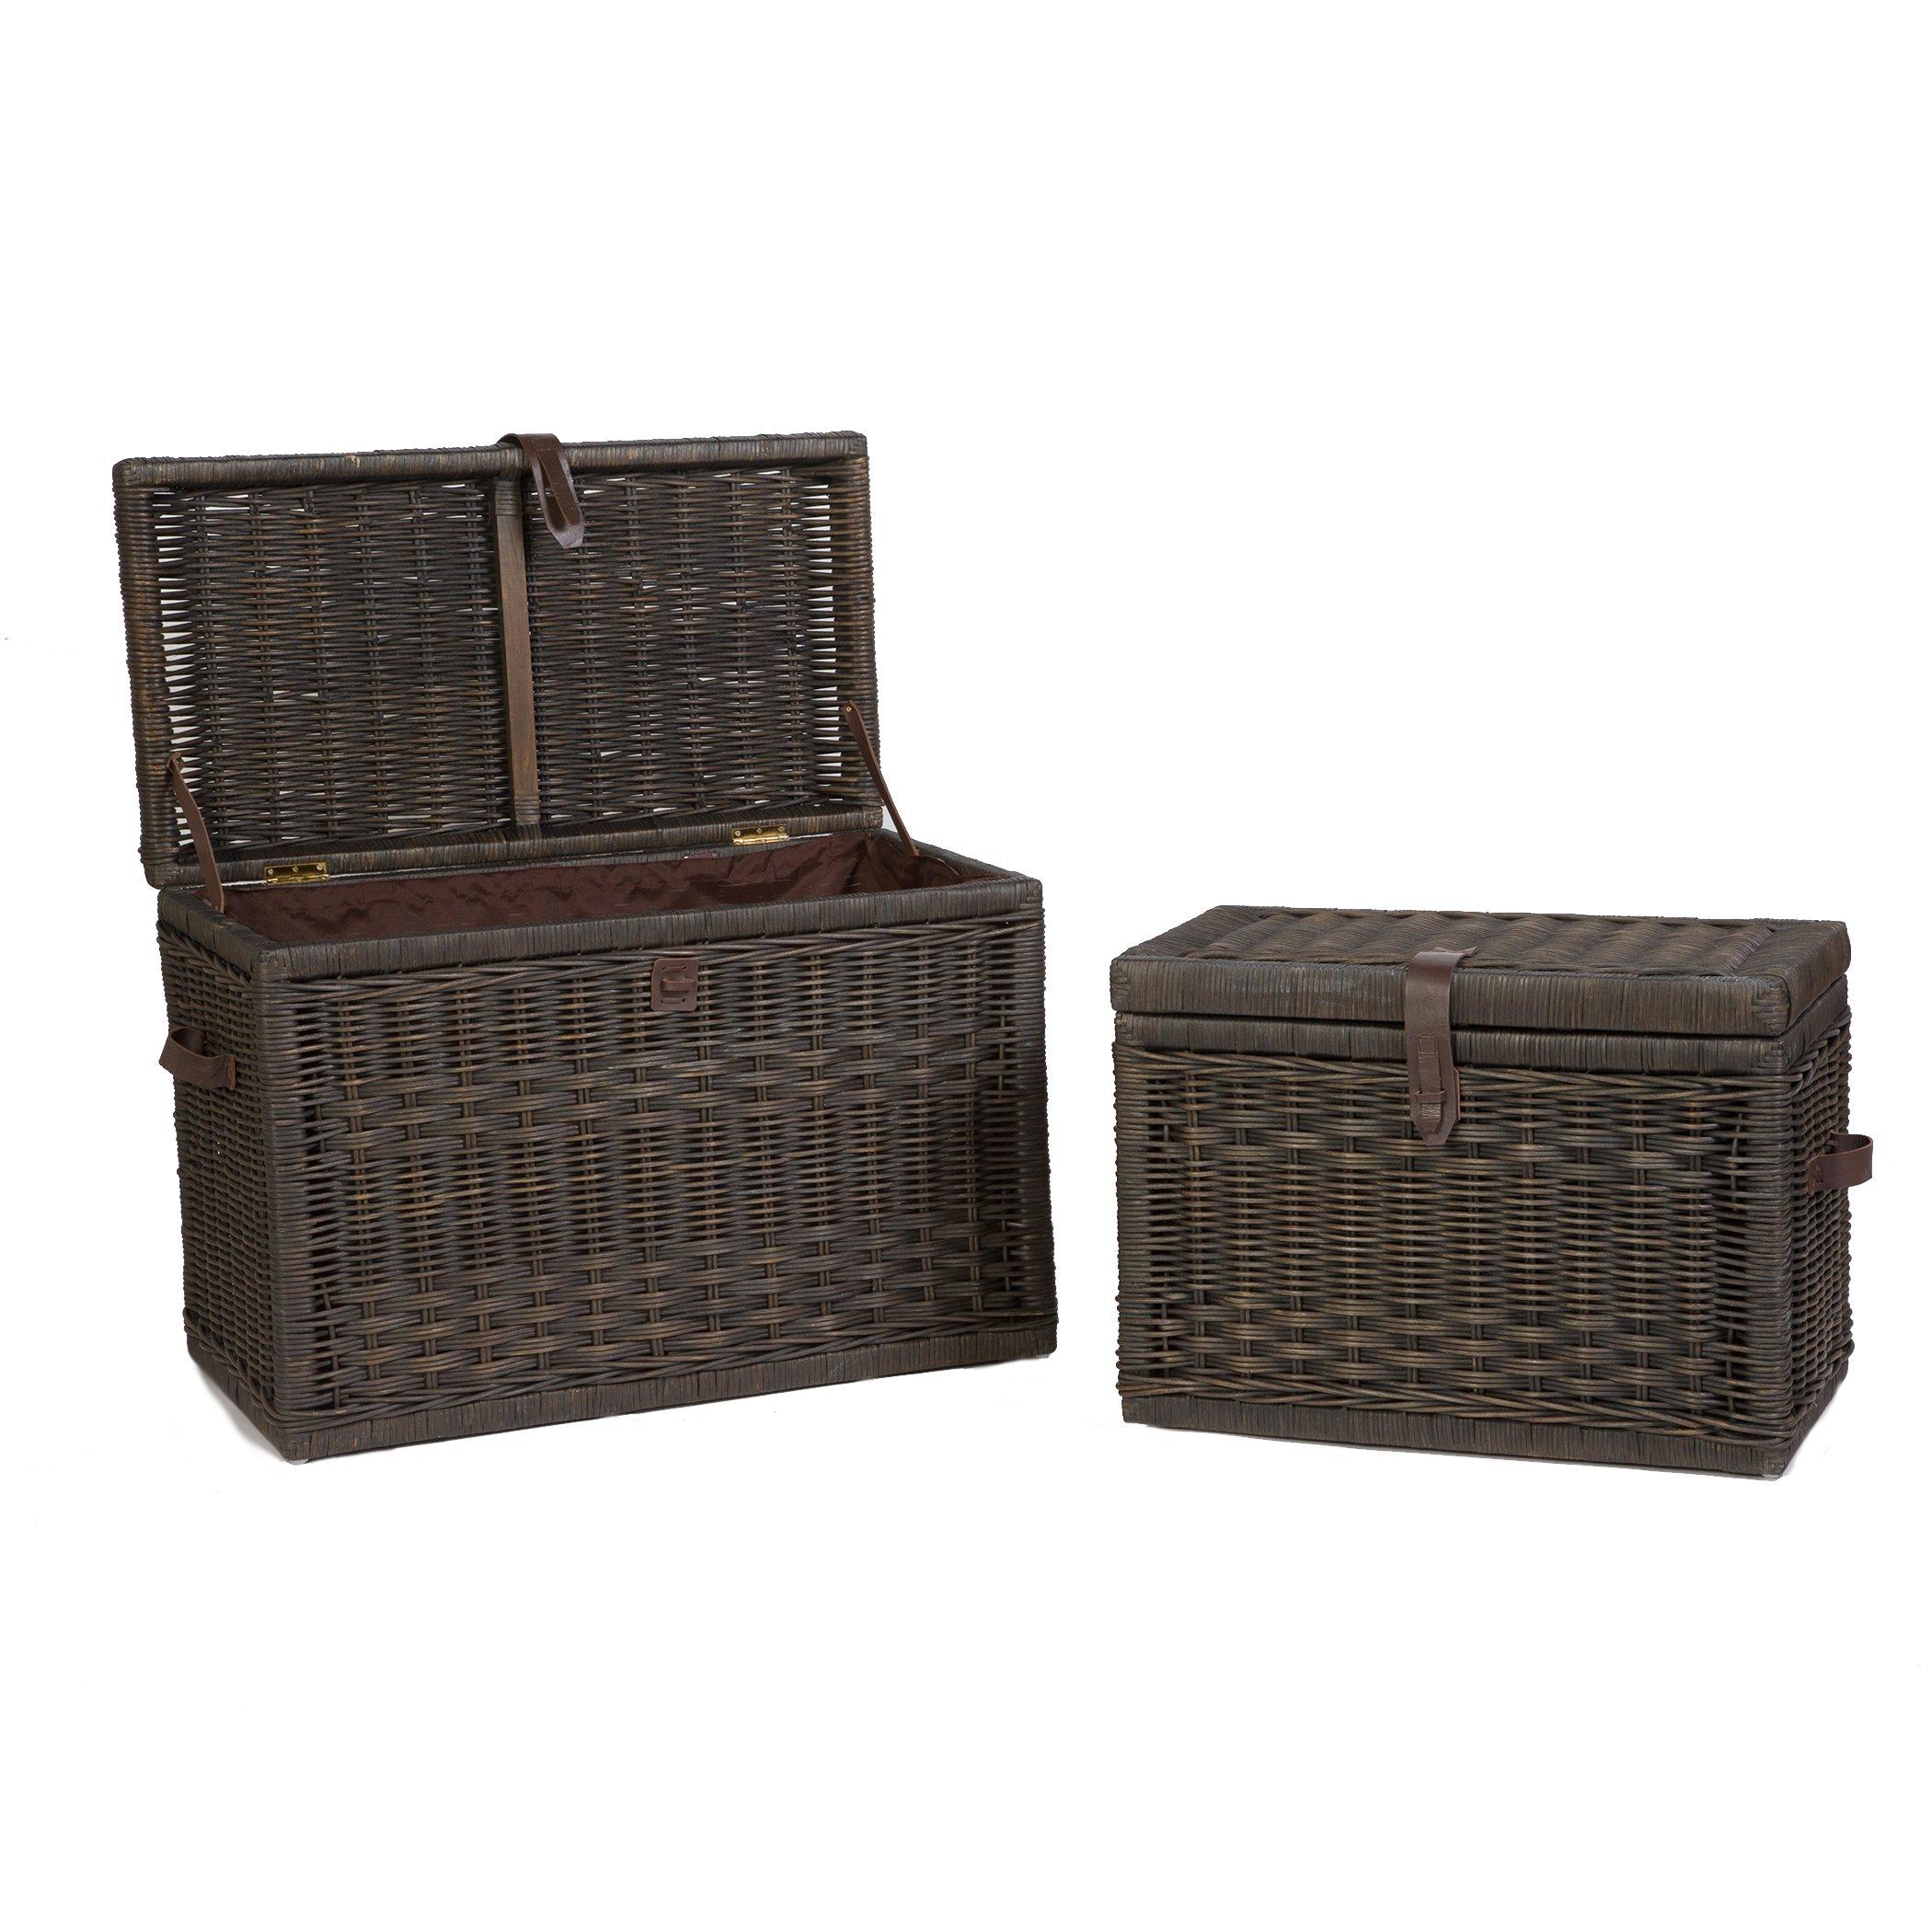 The Basket Lady Wicker Storage Trunk   Wicker Storage Chest, Large, Antique Walnut Brown by The Basket Lady (Image #4)